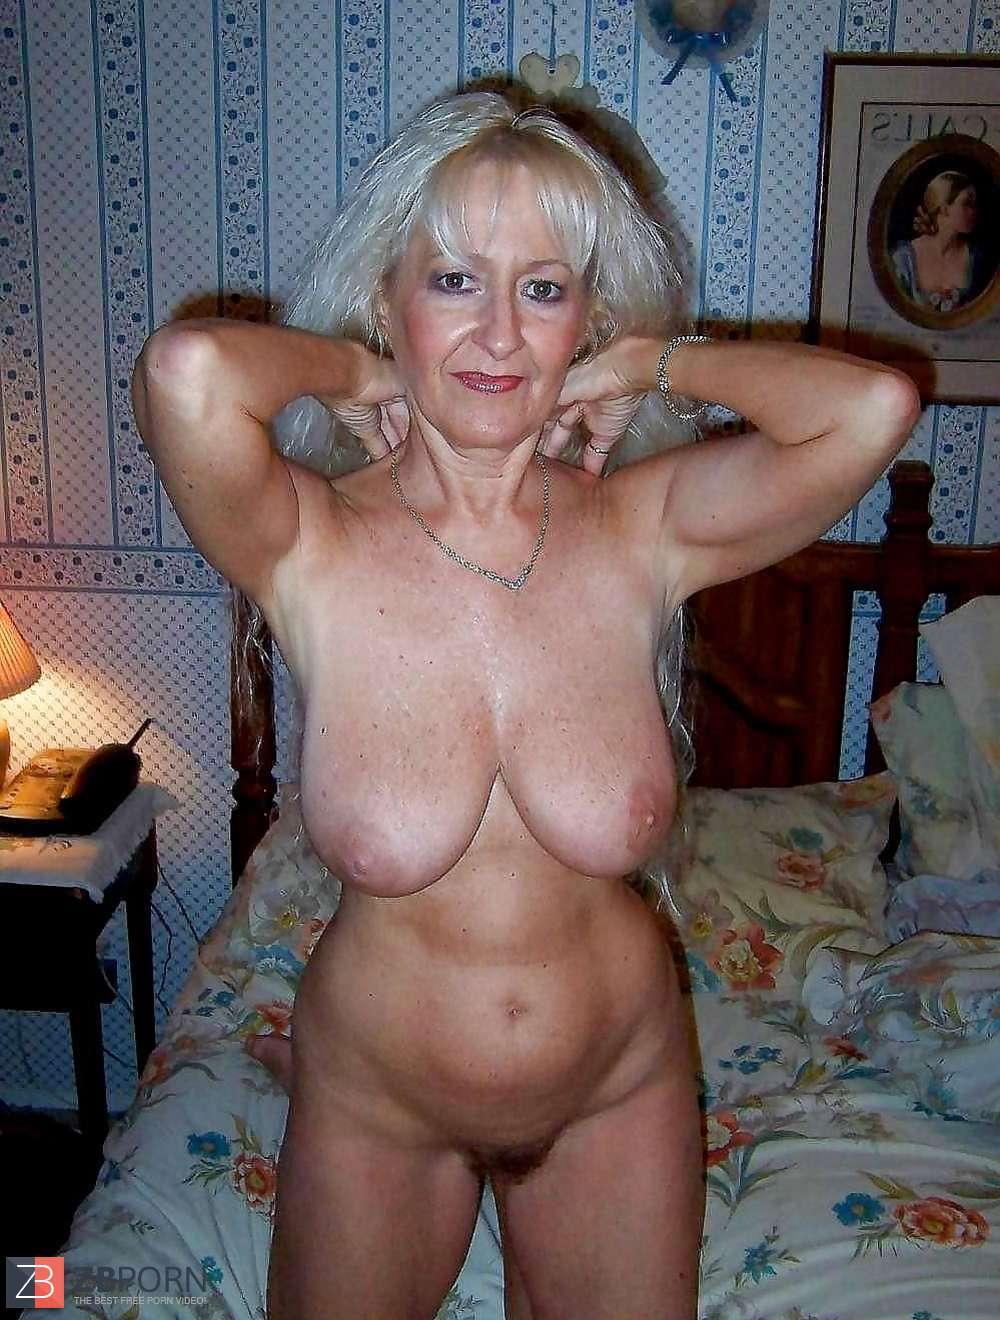 Erotic pantyhose models